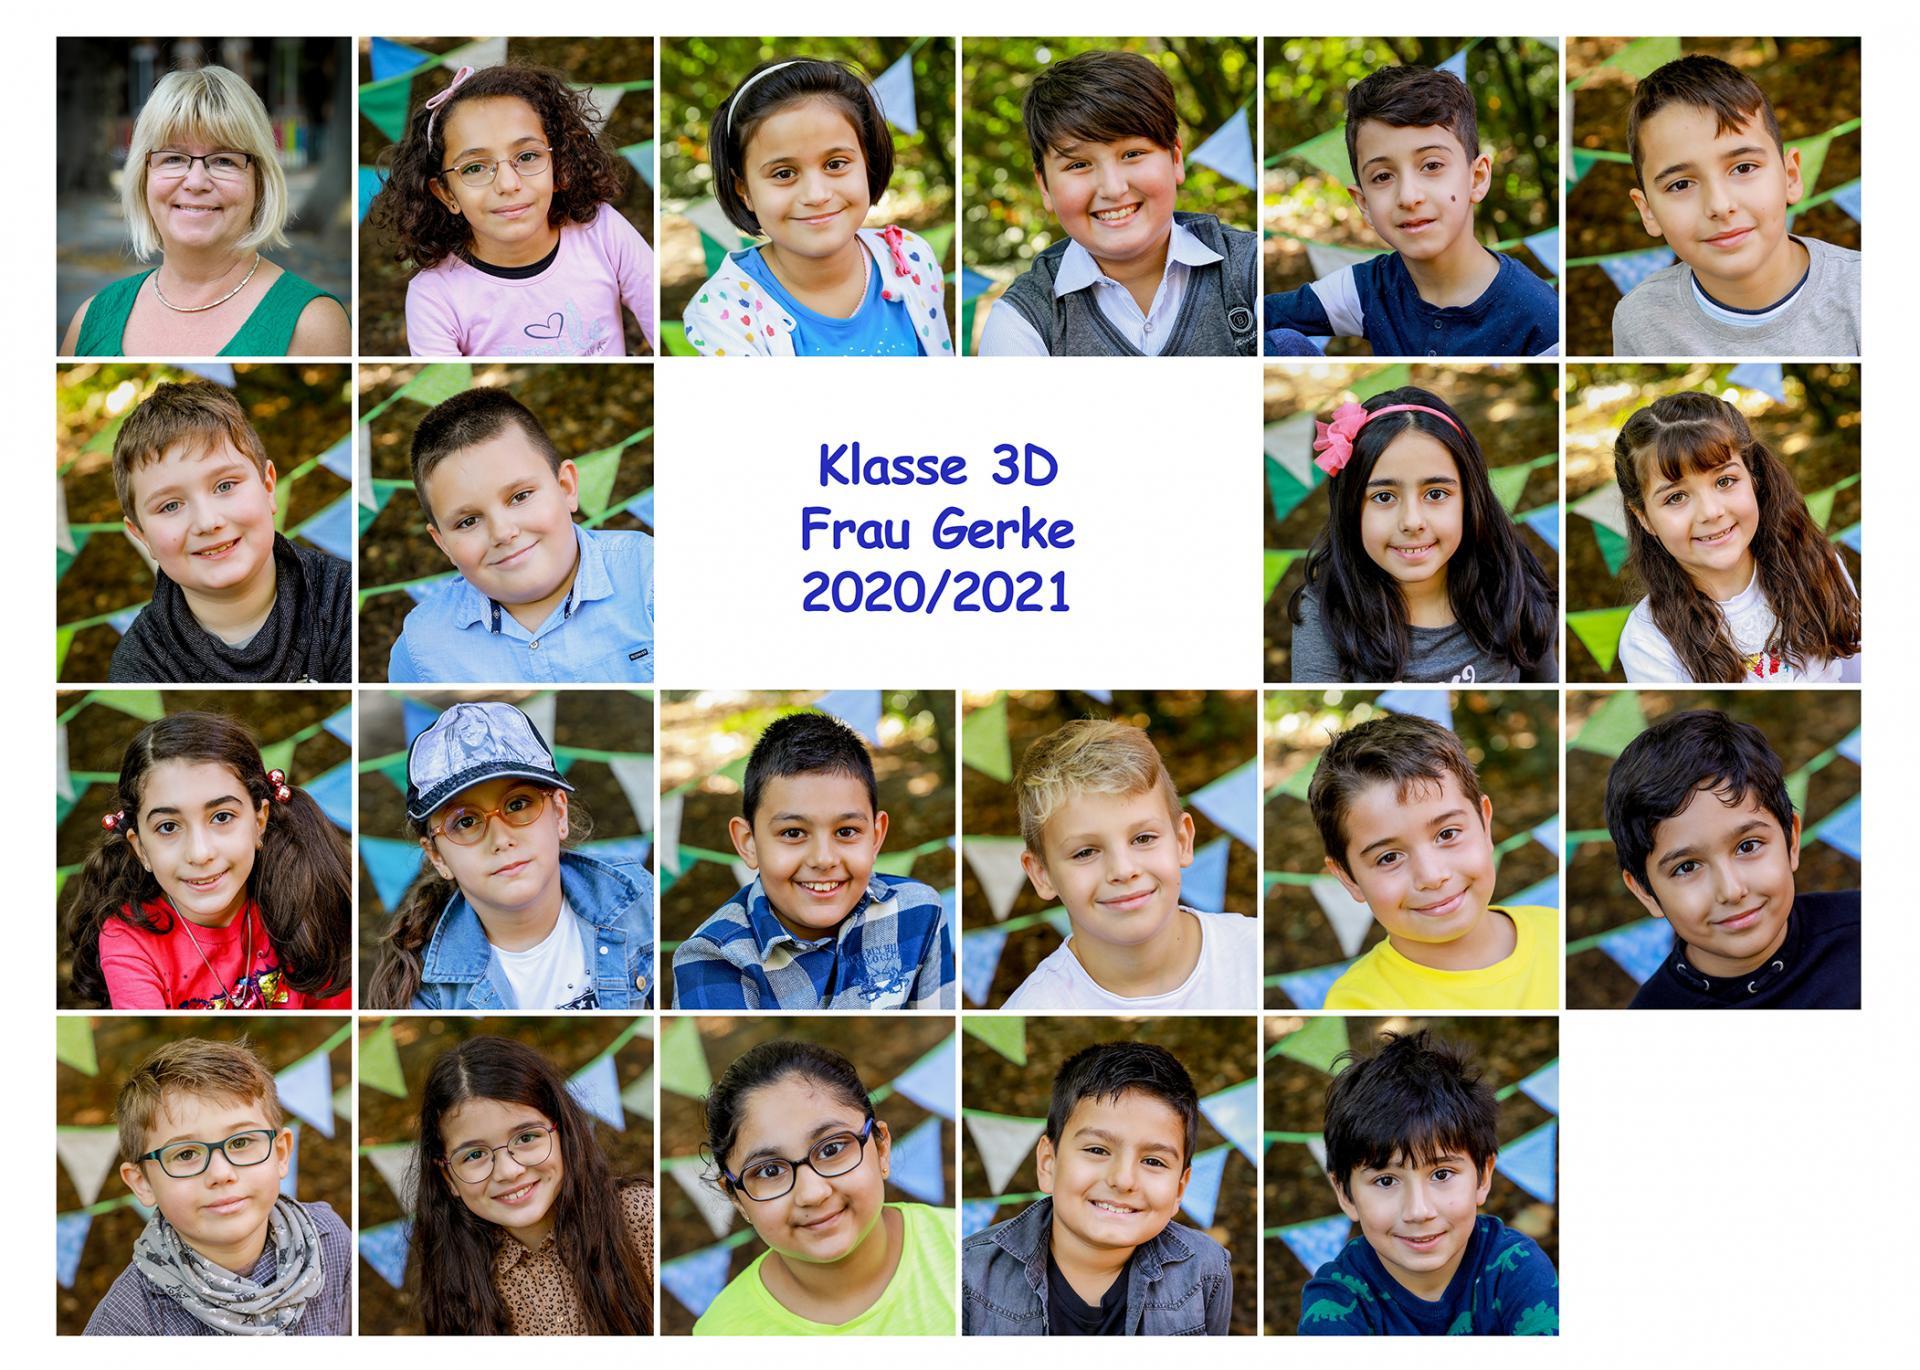 Klasse 3D Schuljahr 20/21